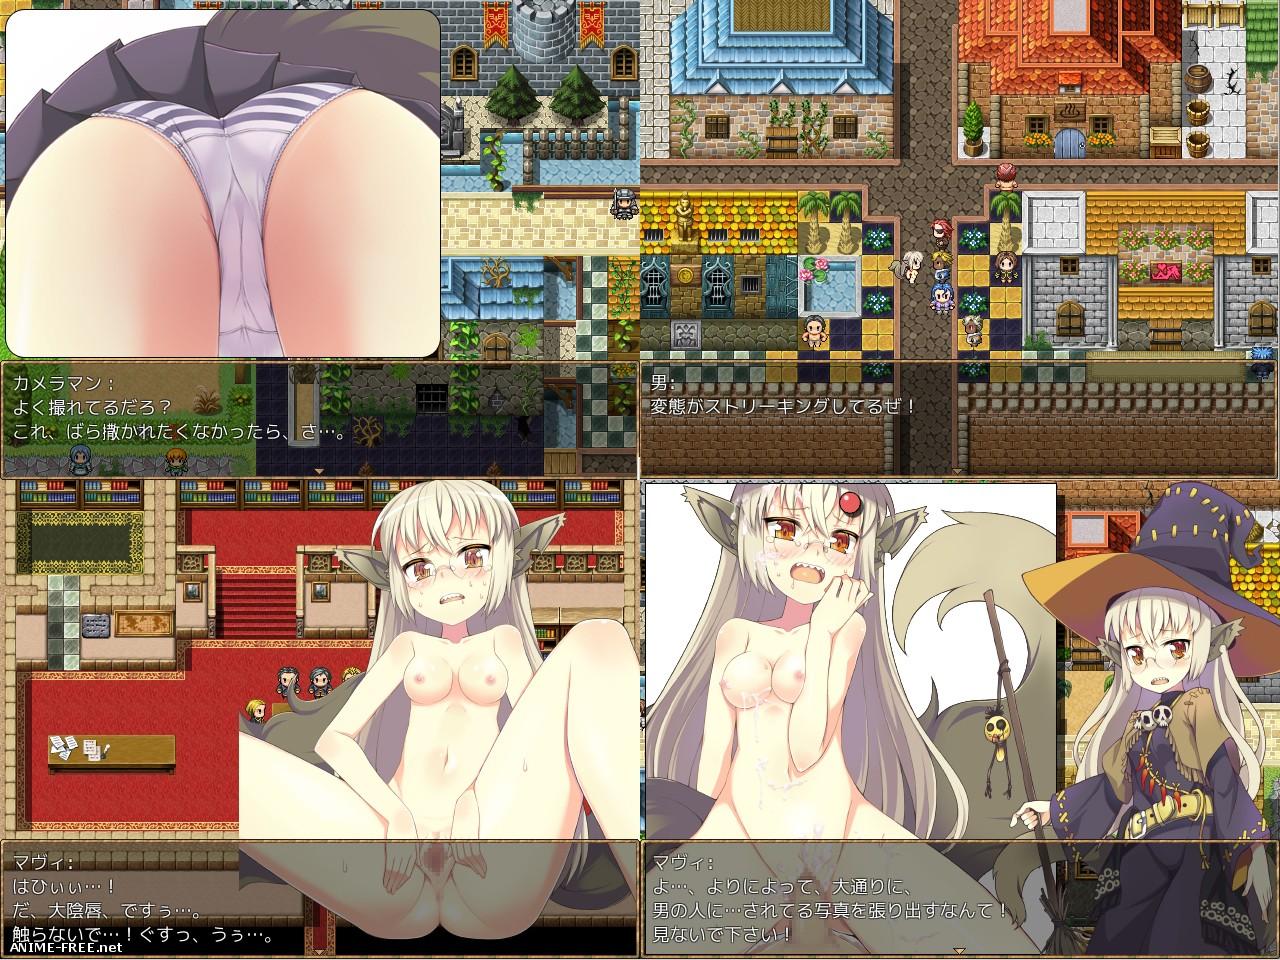 Megane no majo-kko ga hitasura sekuhara sa reru RPG [2015] [Cen] [jRPG] [JAP] H-Game